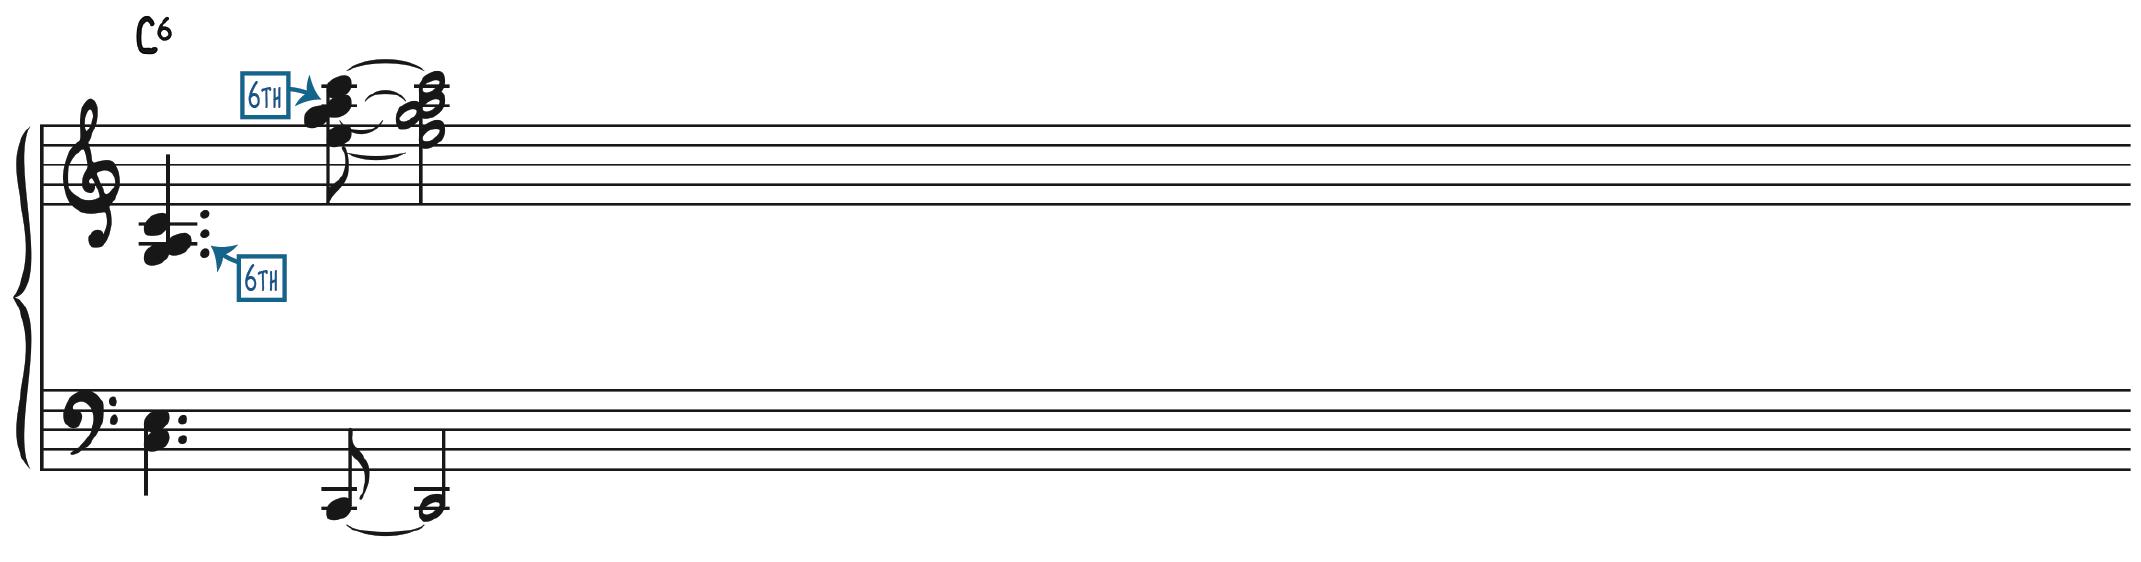 Jazz Piano Major Chords Add 6th